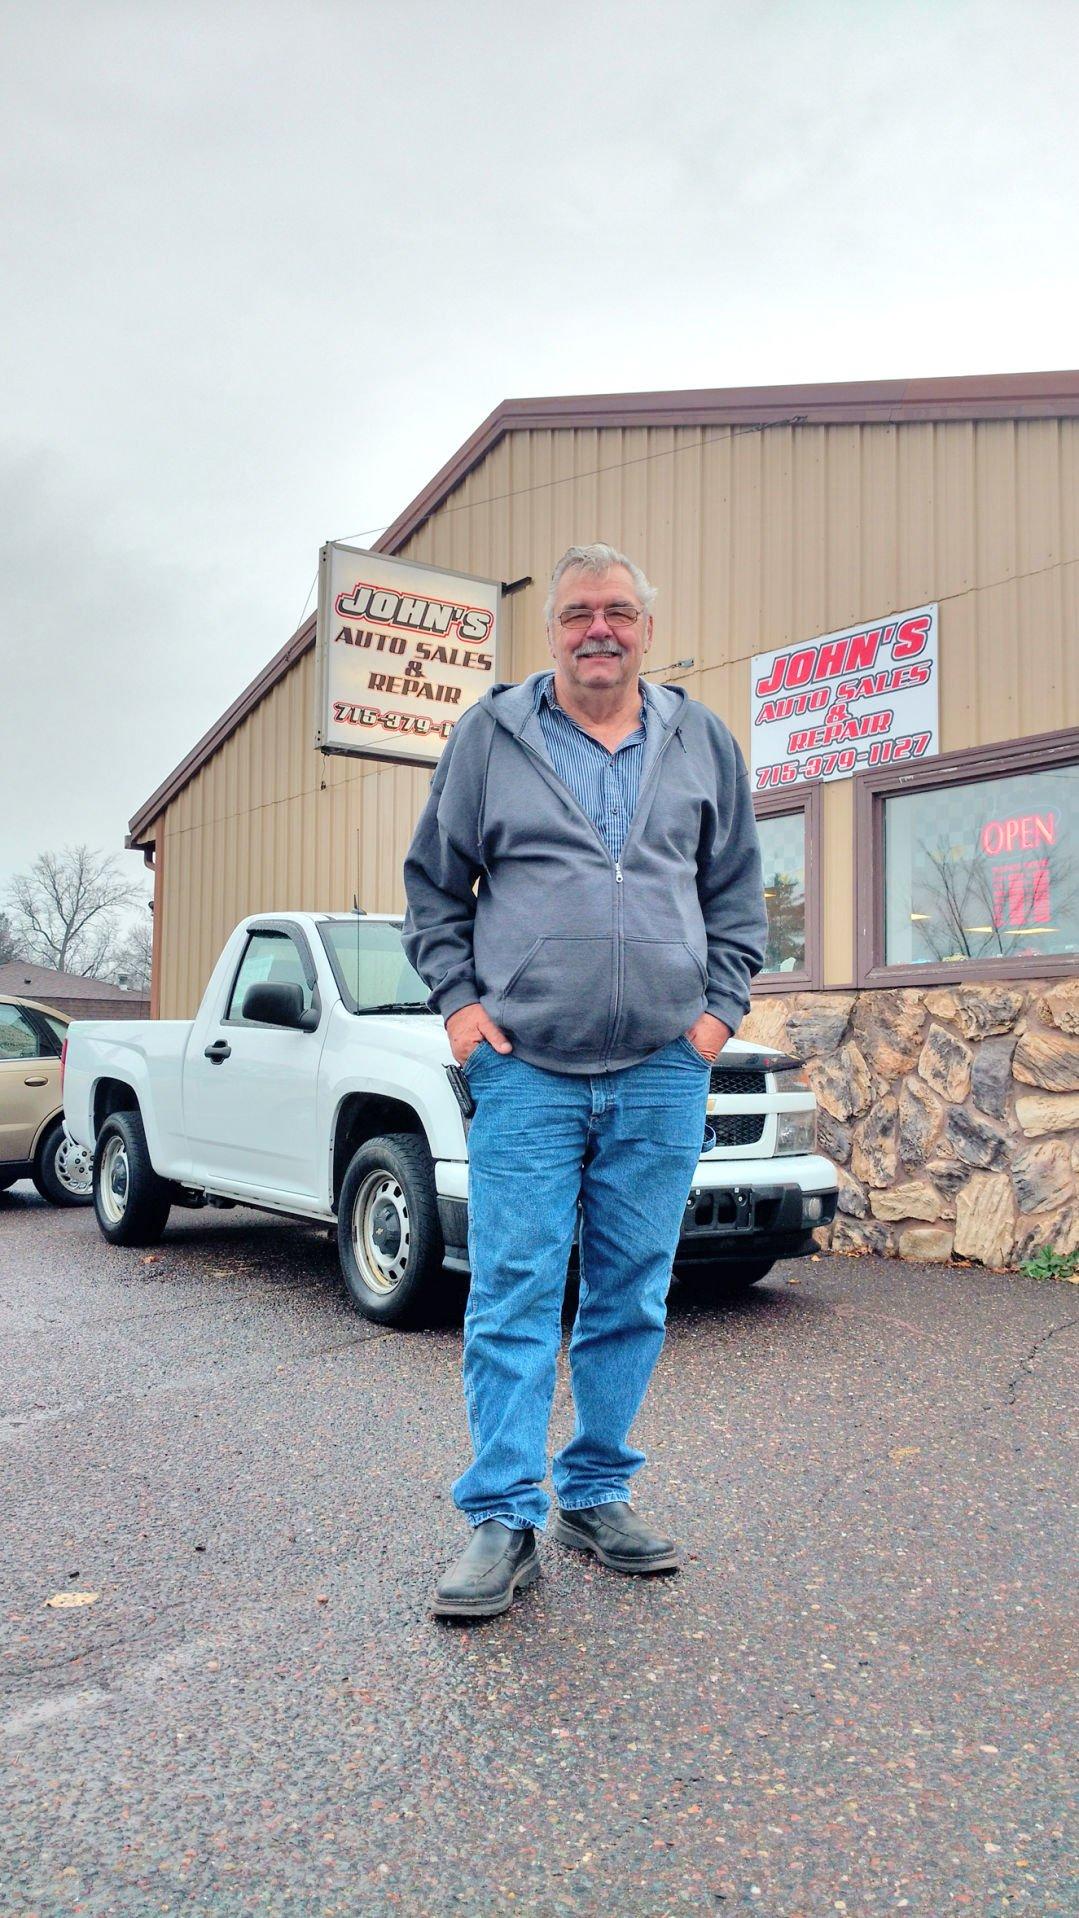 New auto sales repair shop open Business